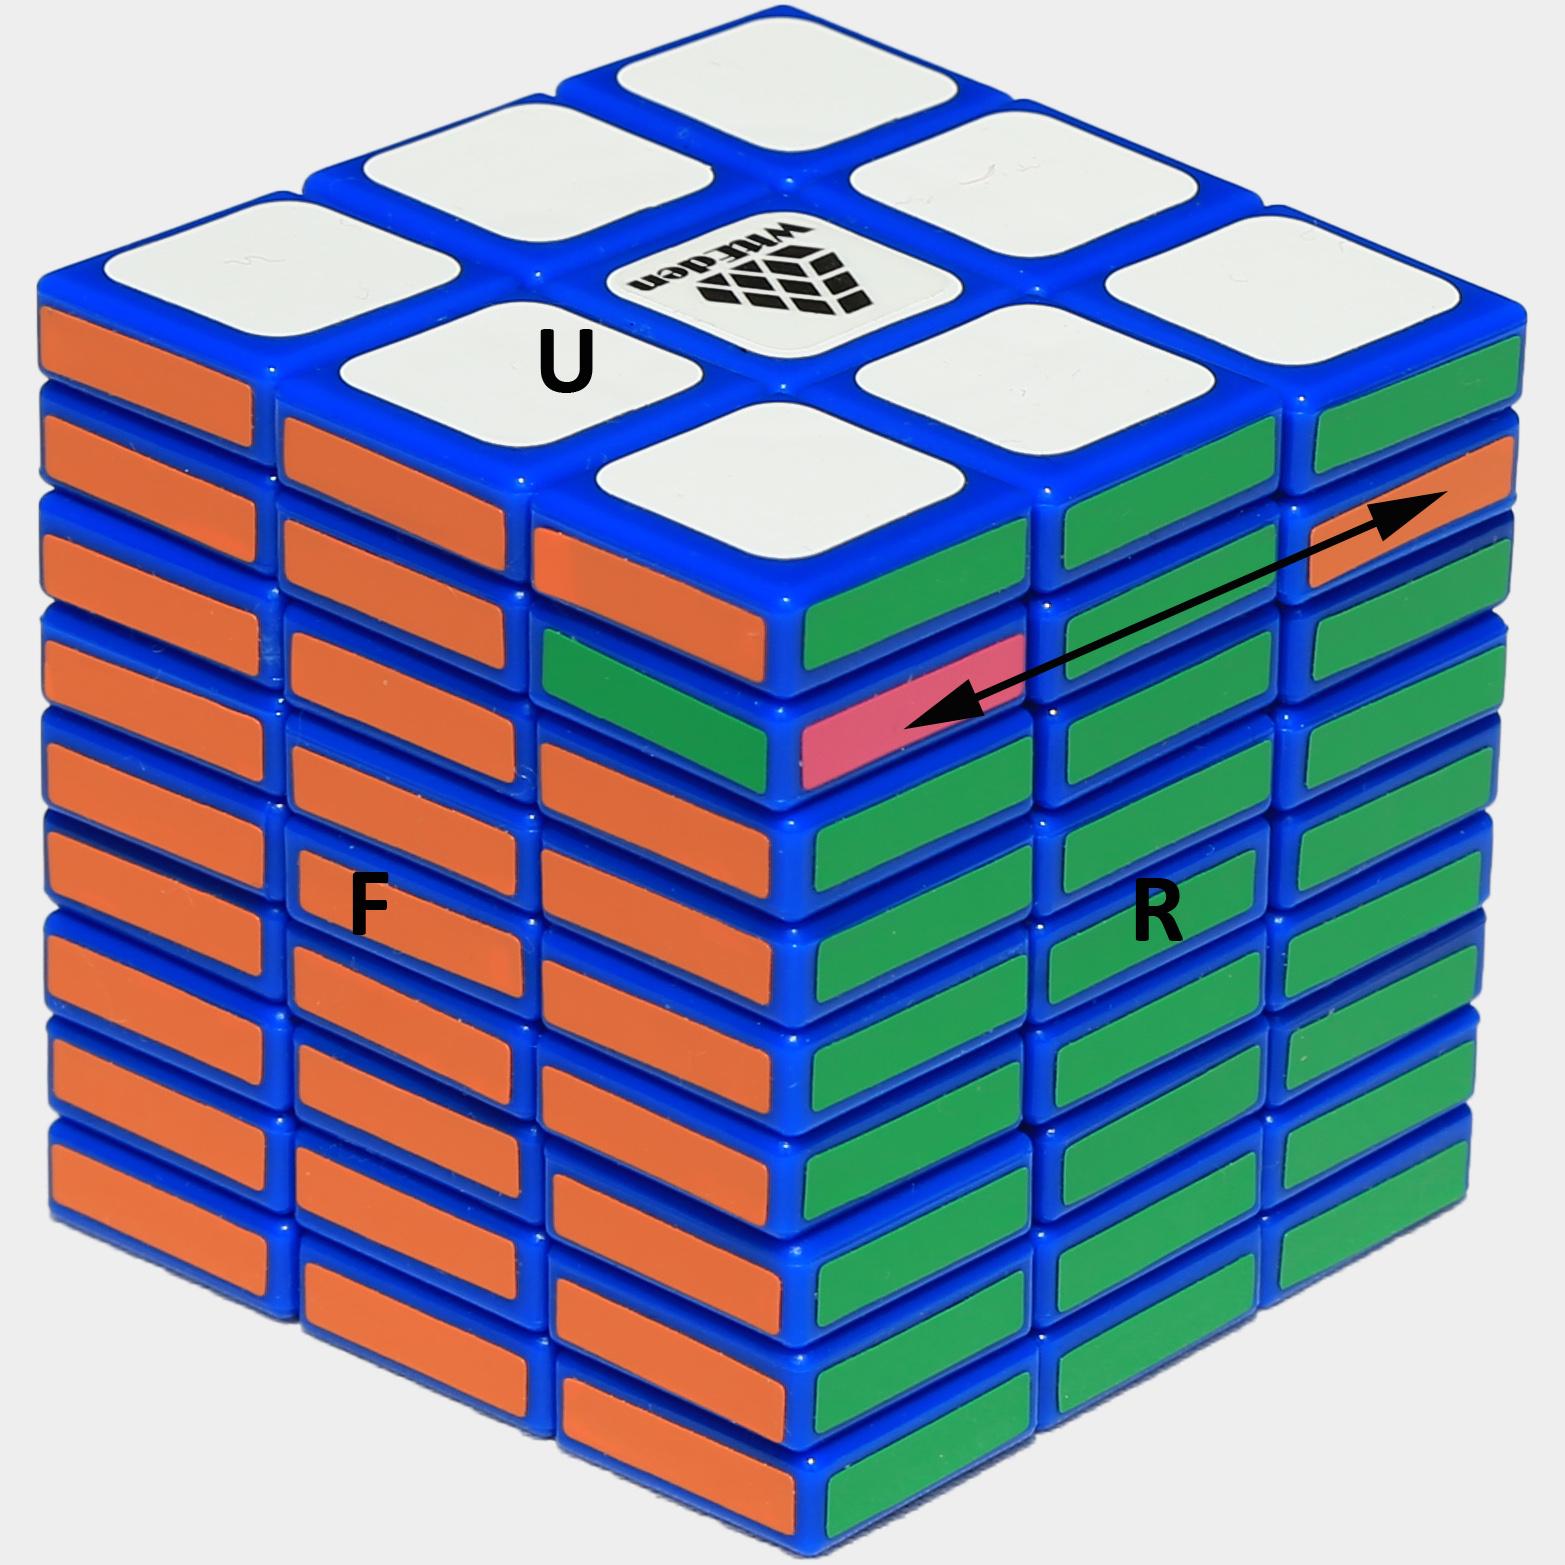 TwistyPuzzles com Forum • View topic - WitEden 3x3x9 v2 help!